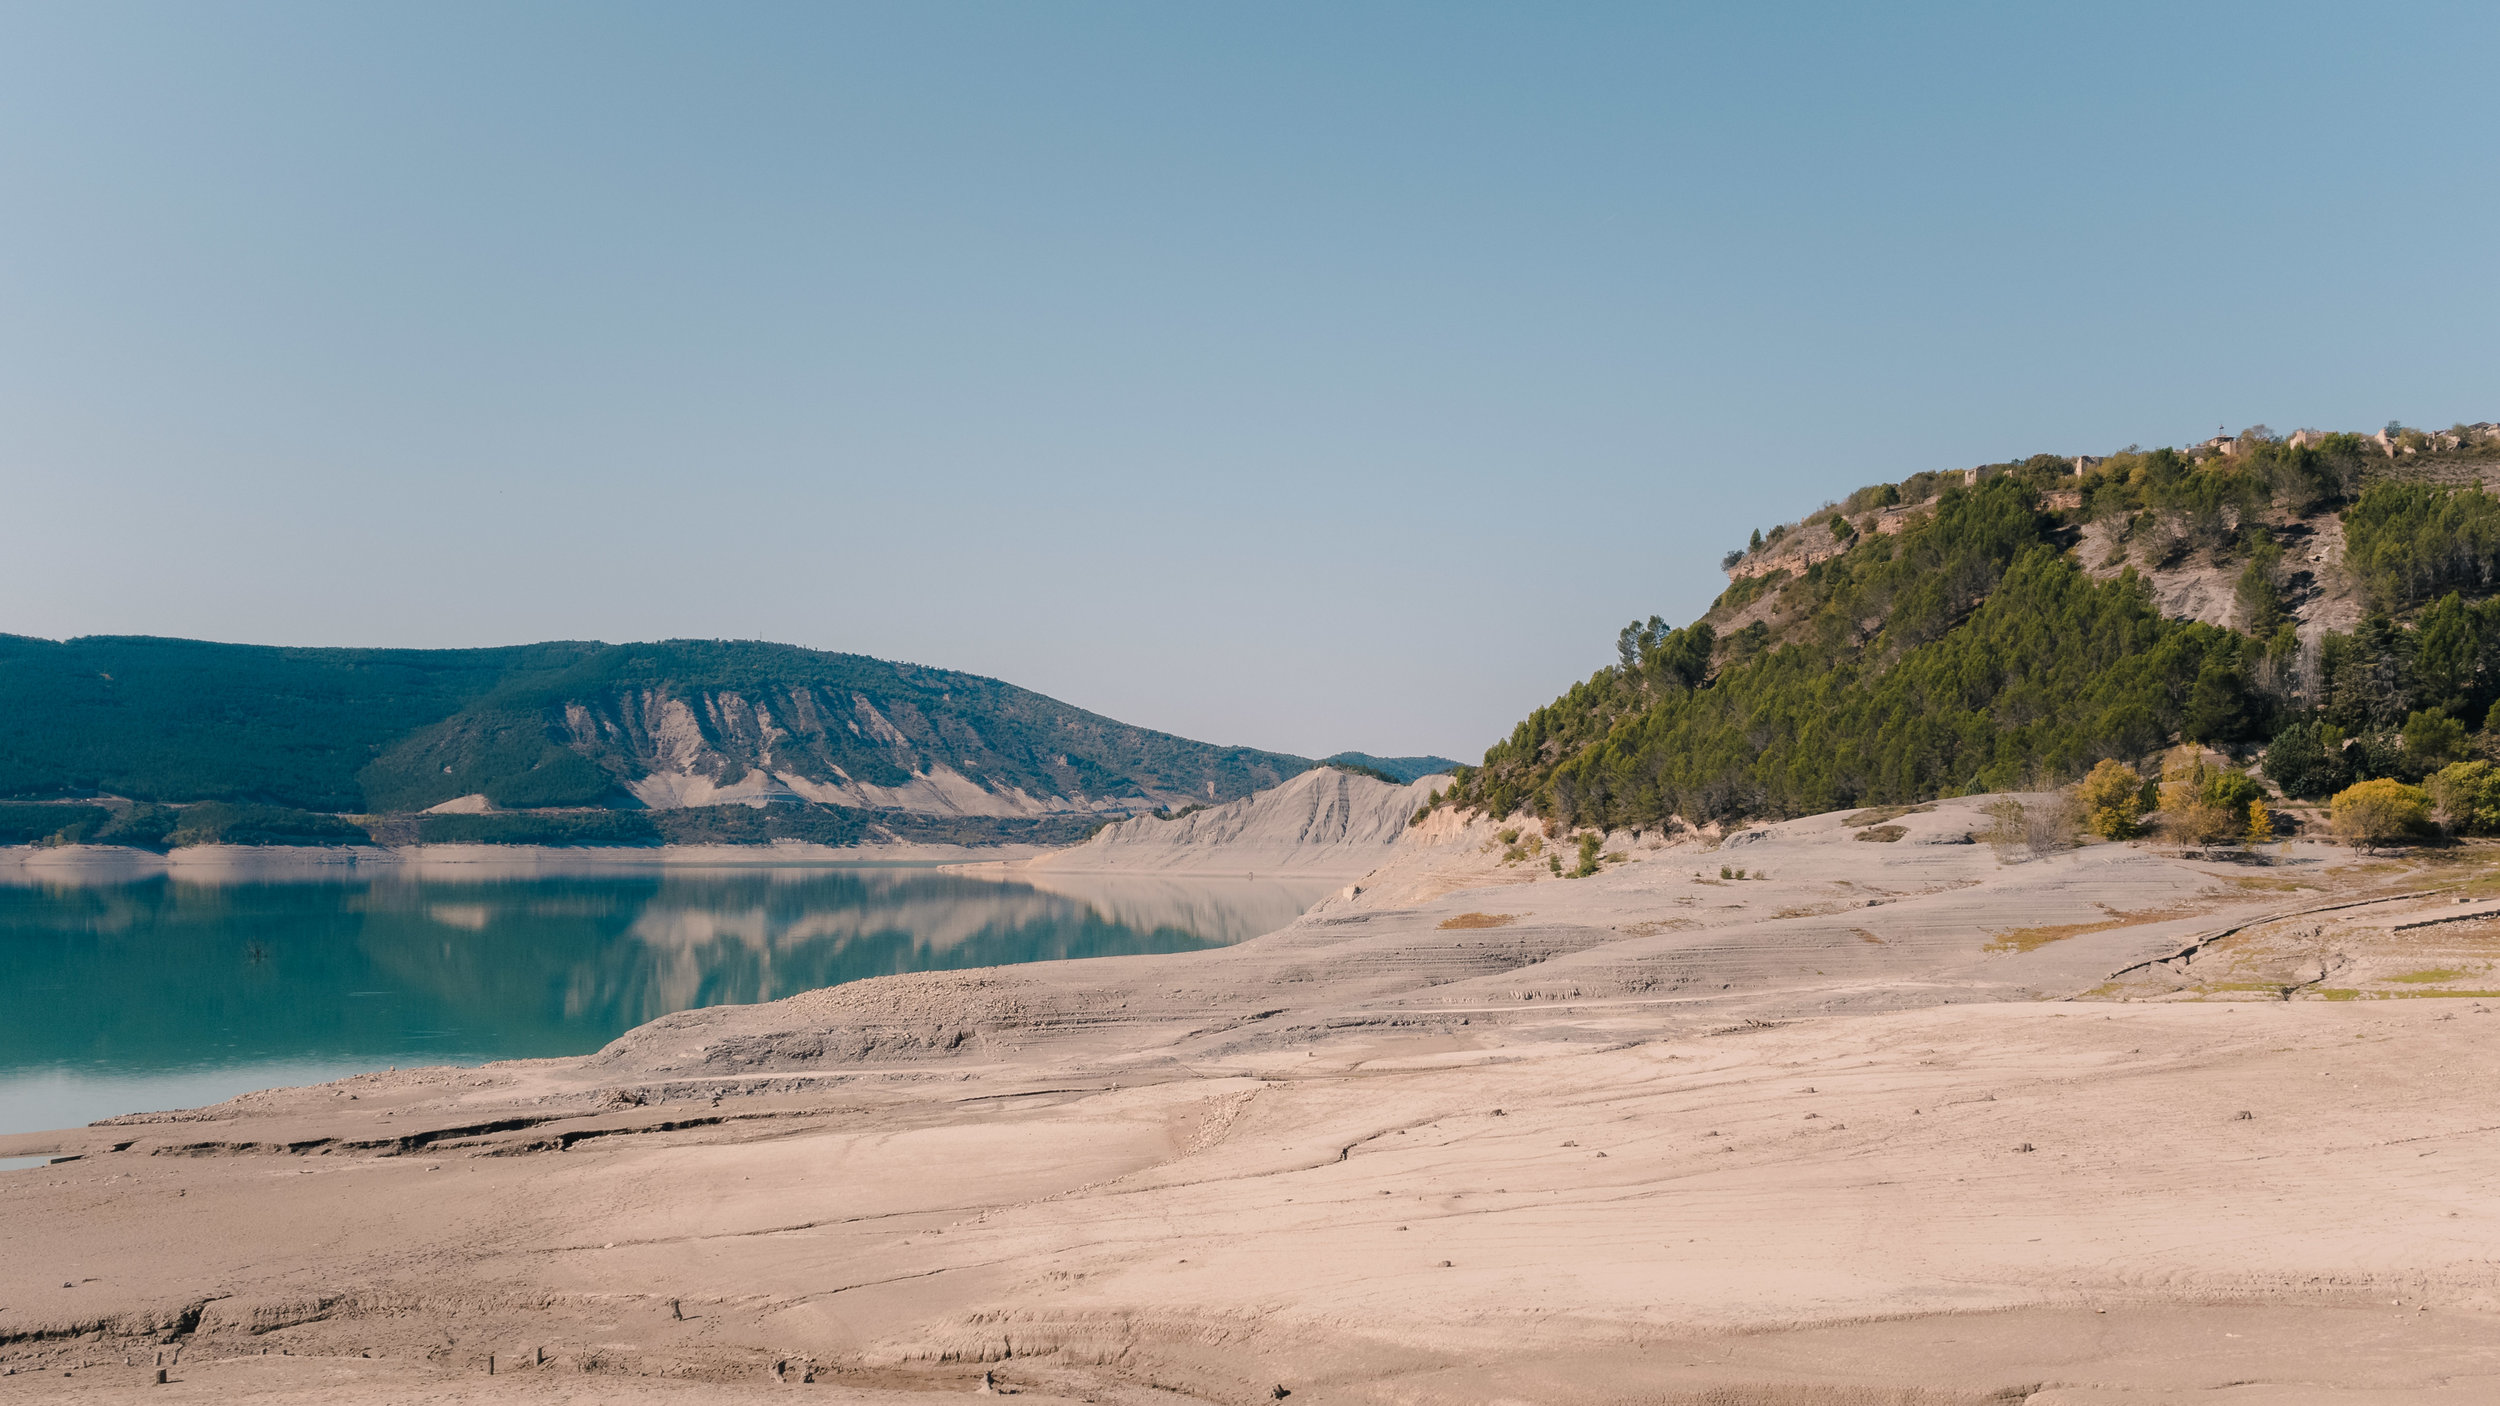 Yesa Reservoir in Aragon.